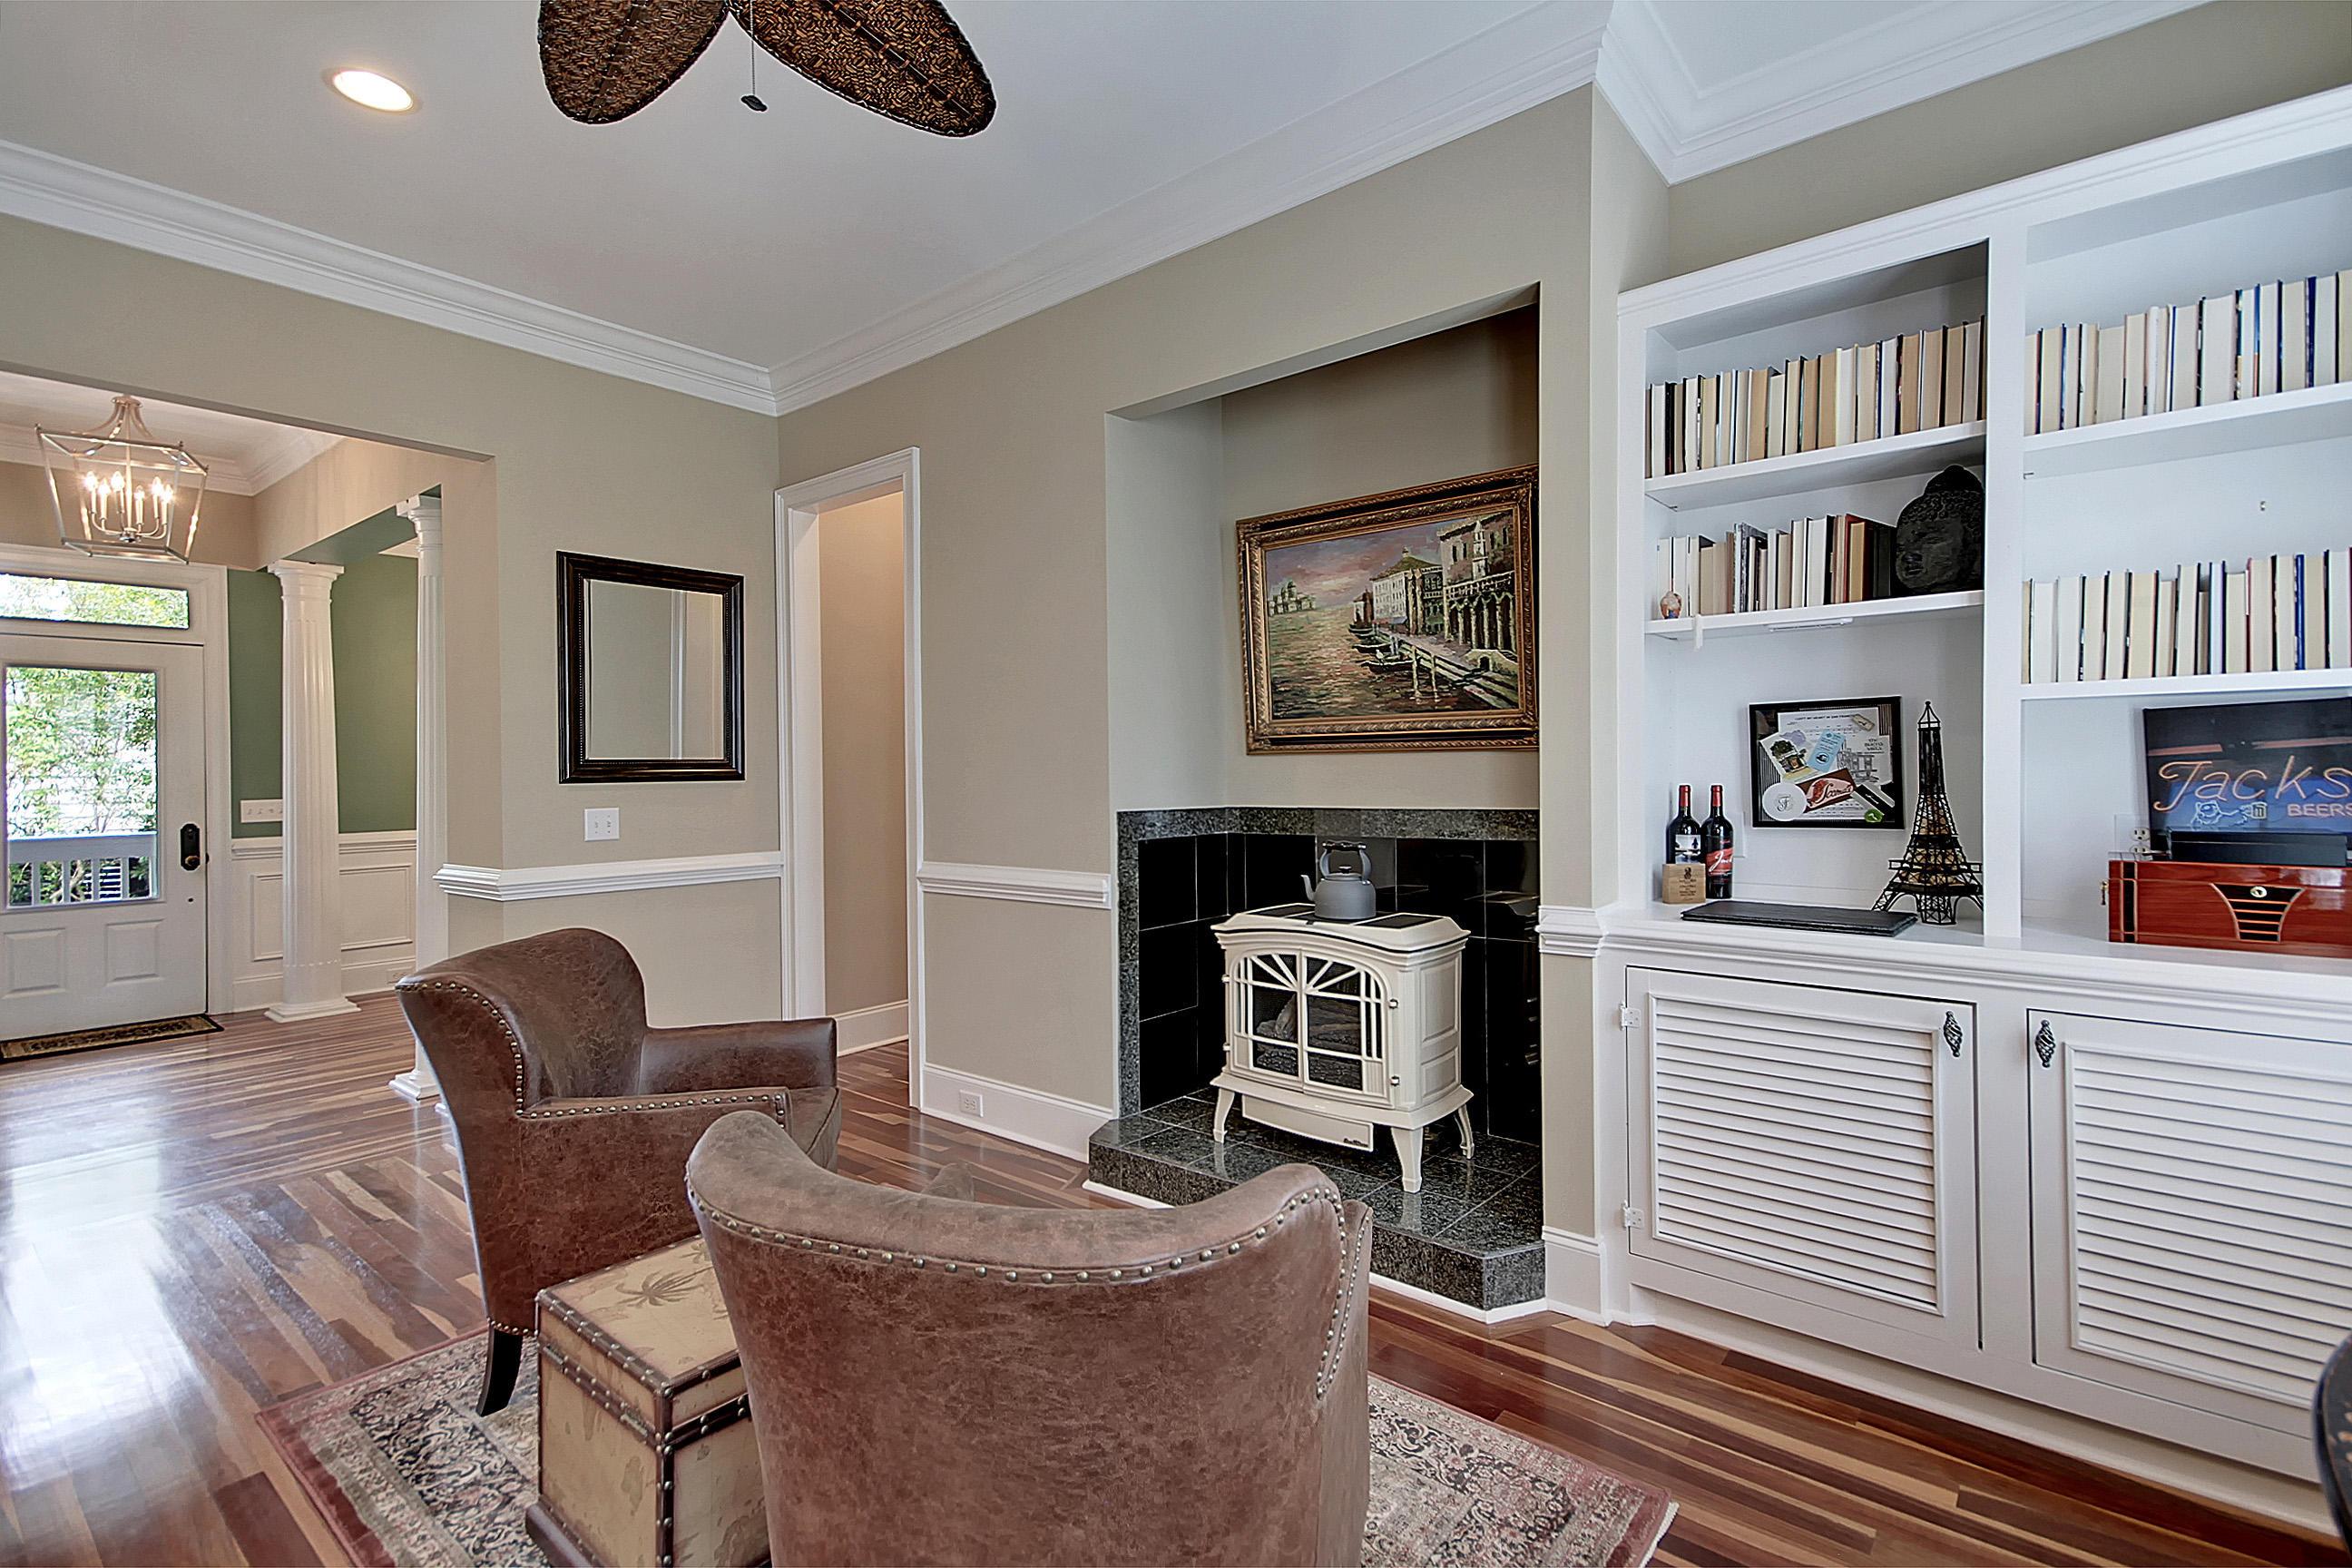 Belle Hall Homes For Sale - 368 Evian, Mount Pleasant, SC - 0